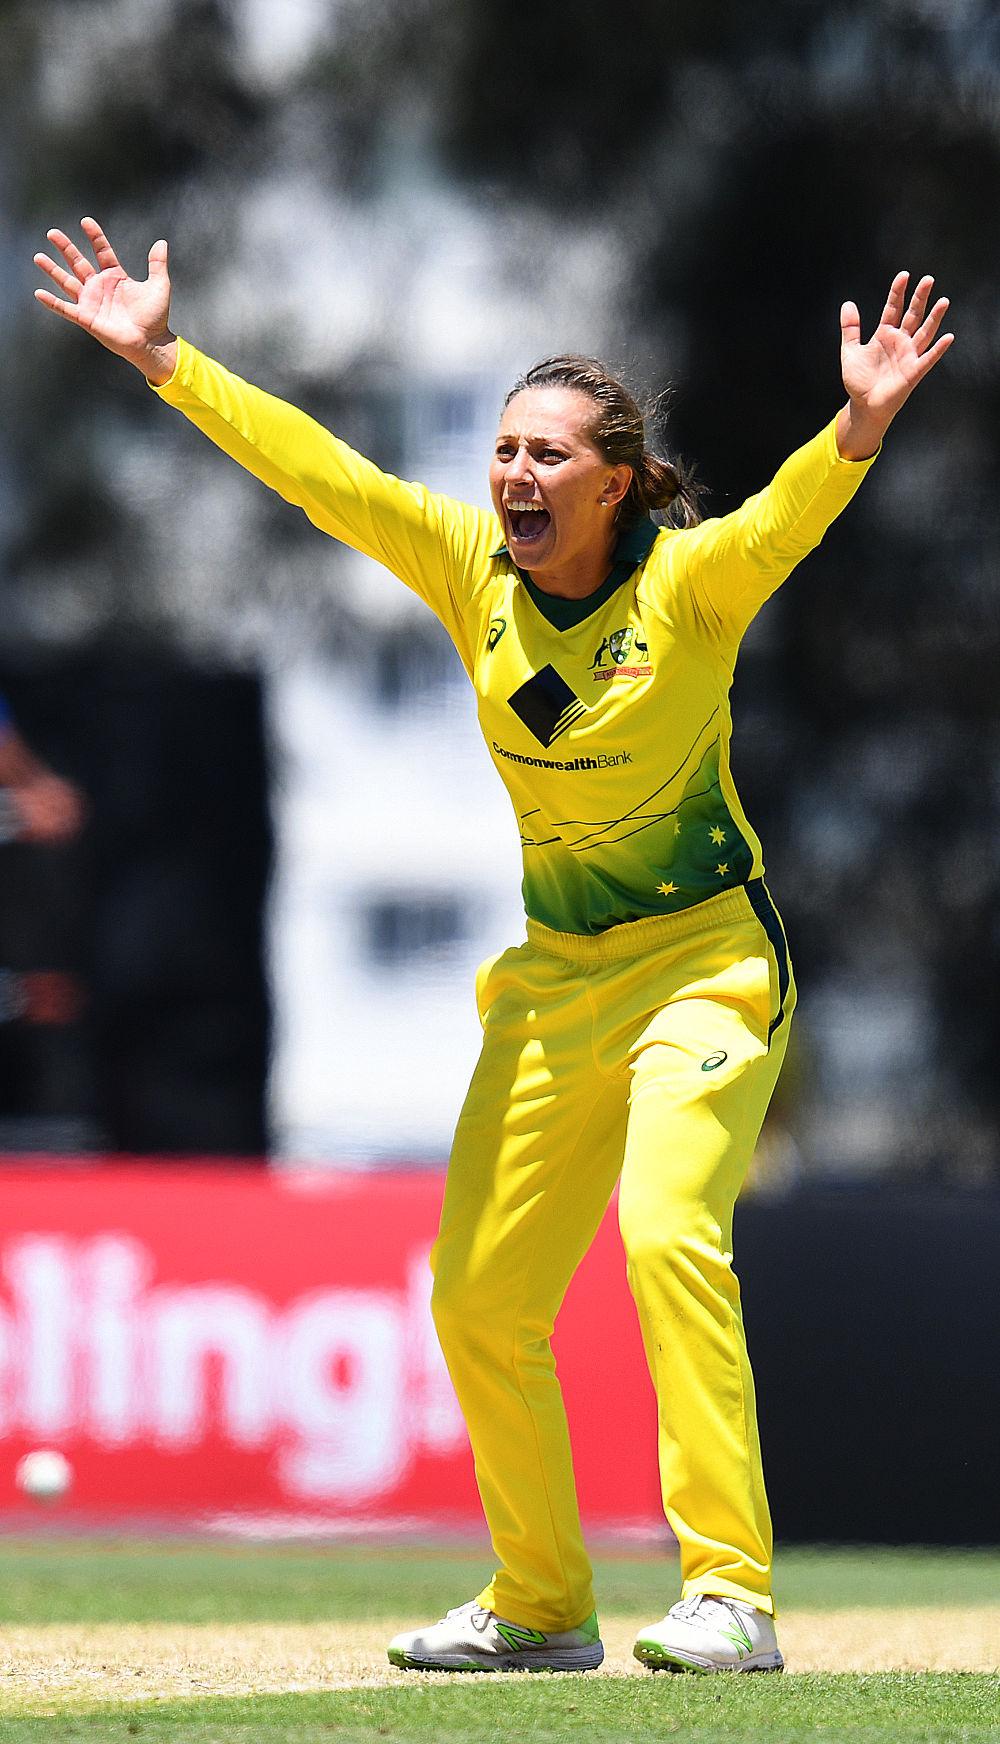 Ashleigh Gardner Australia women's cricket tall